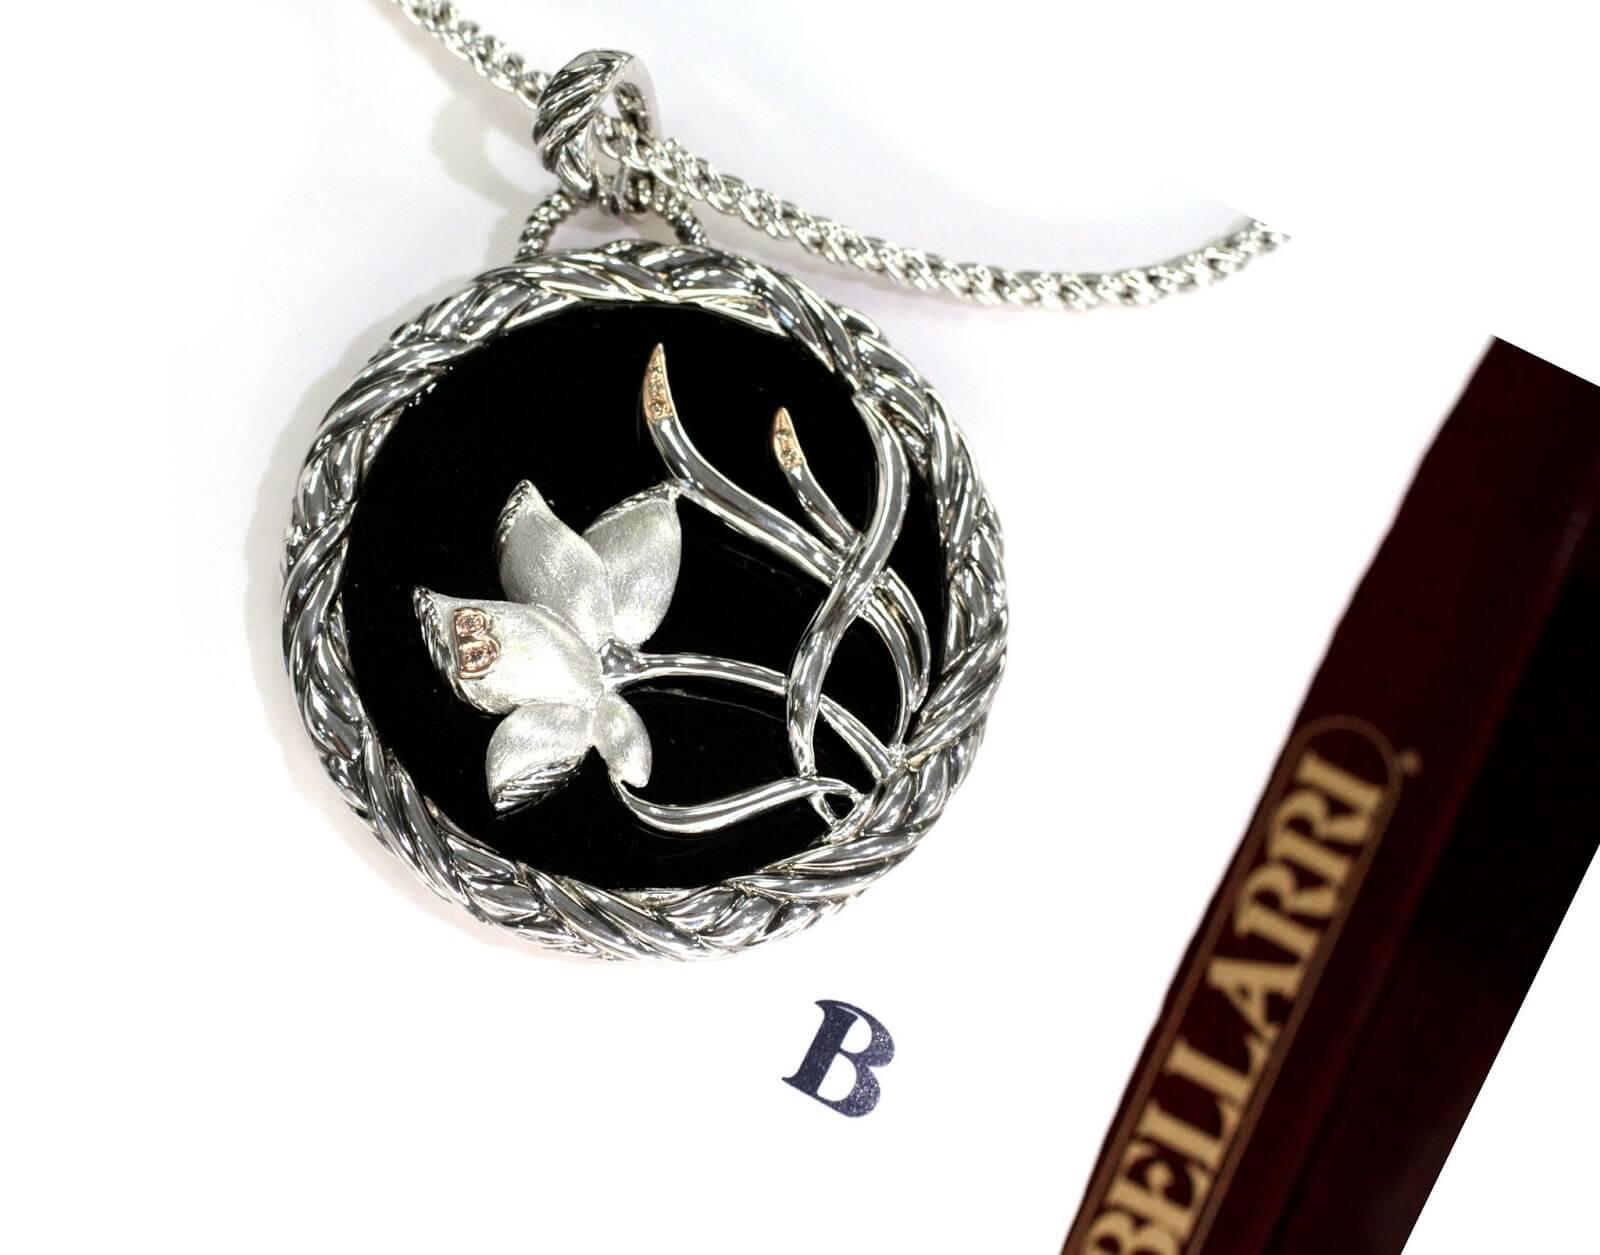 Bellarri Silver onyx pendant